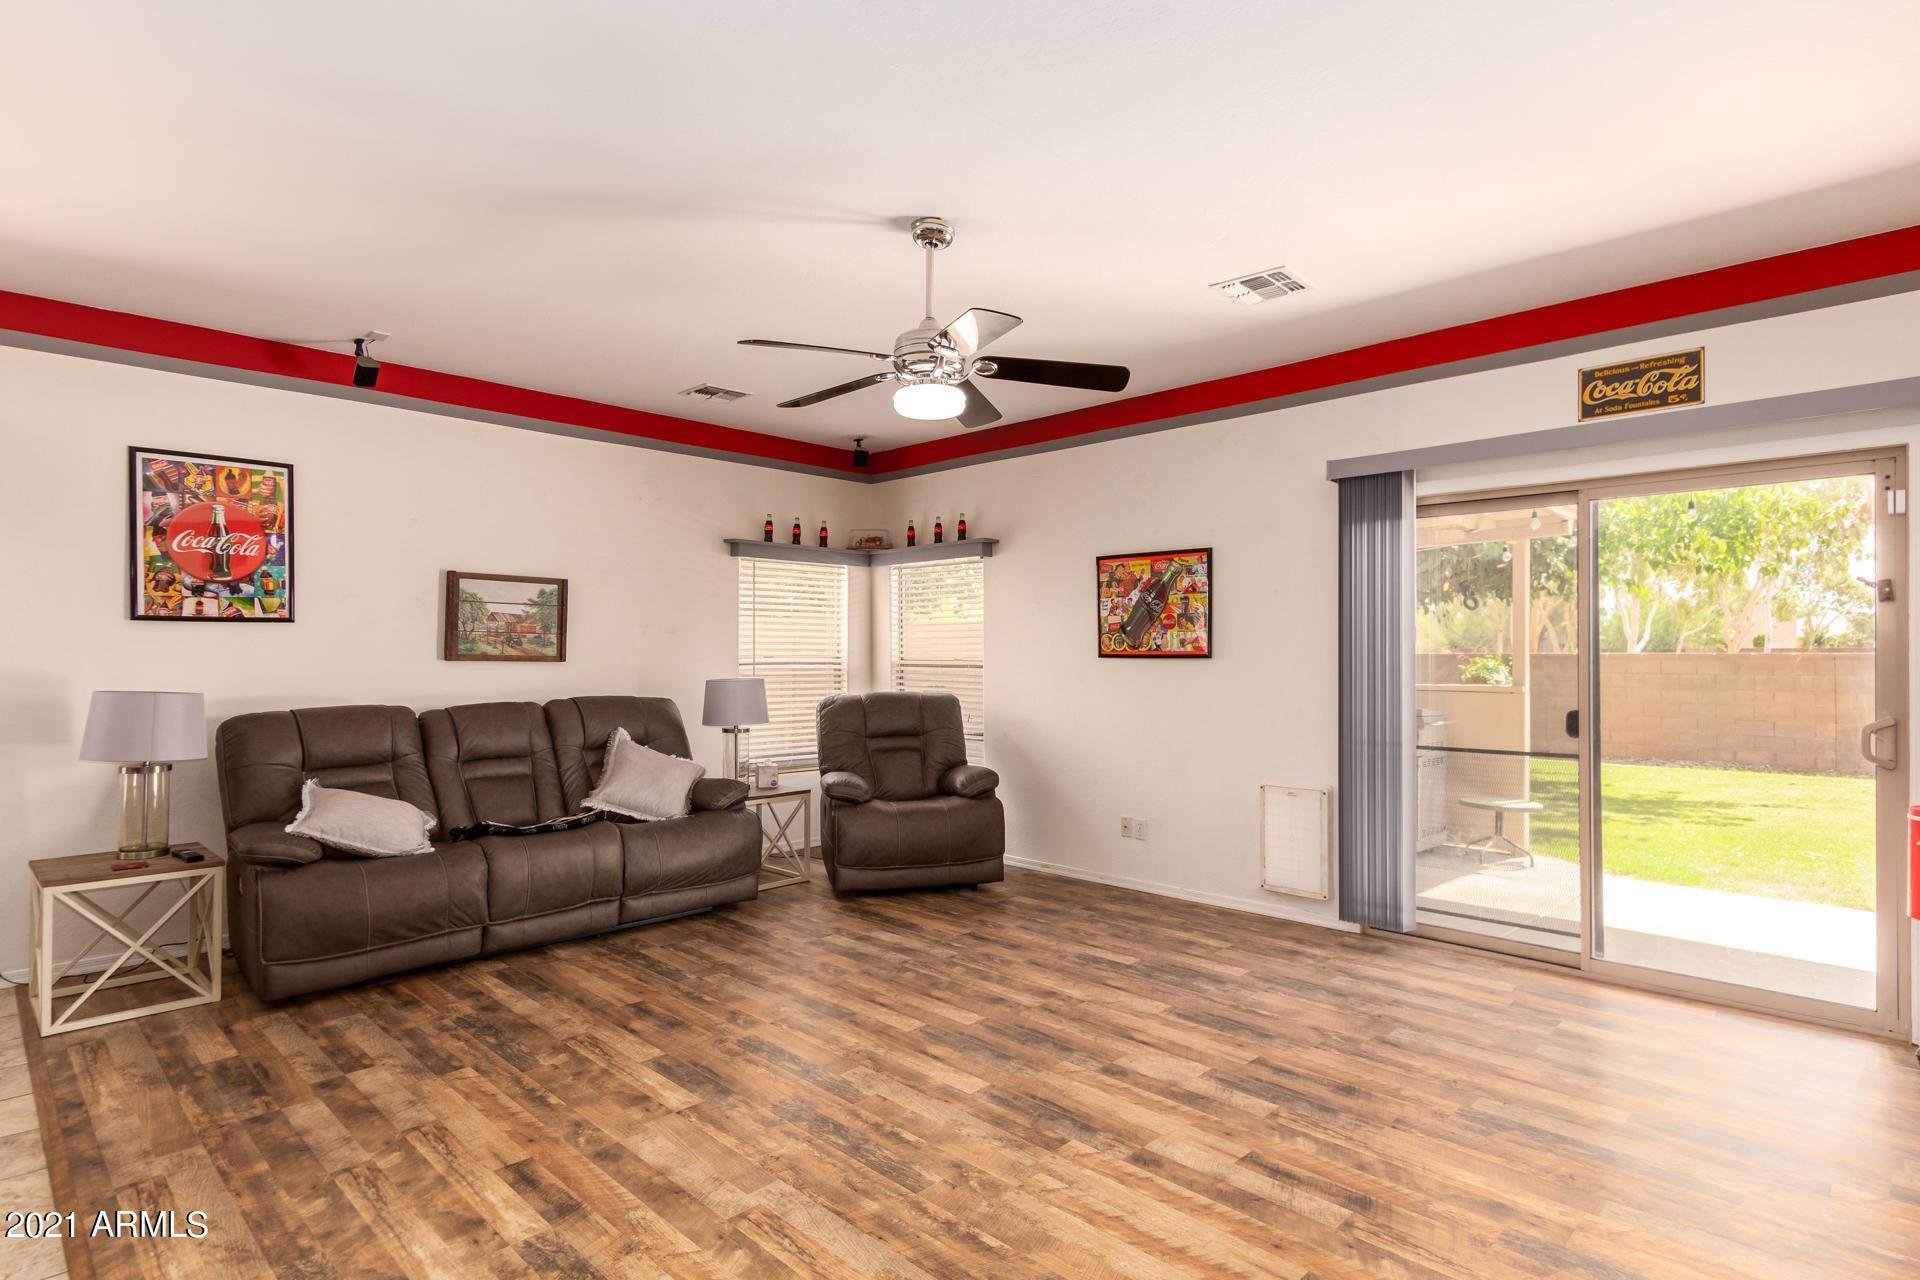 Photo of 1013 S 118TH Avenue, Avondale, AZ 85323 (MLS # 6244652)